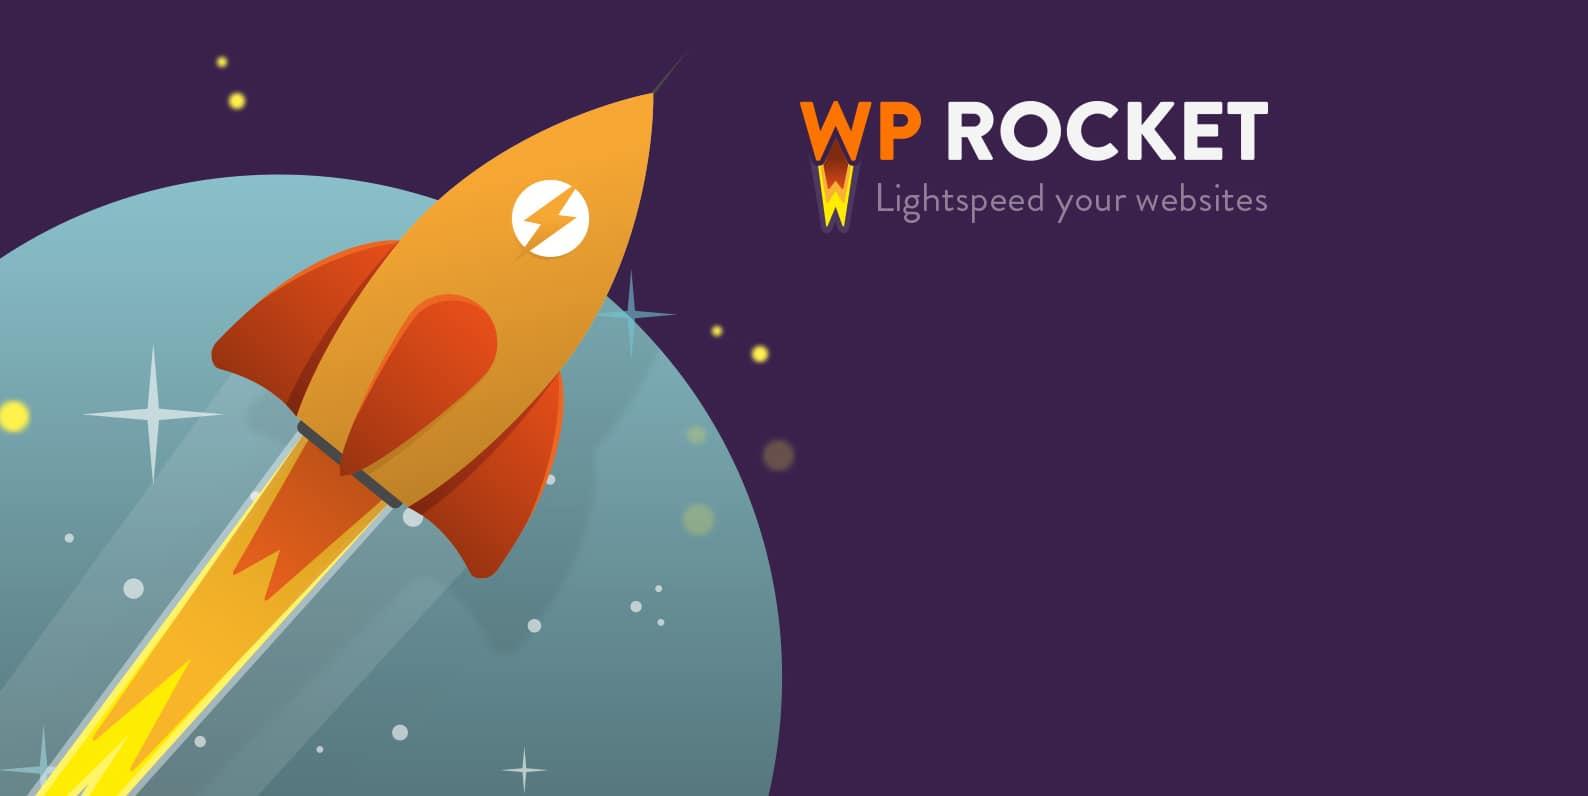 「WP插件」 加速插件 WP Rocket v3.4.3 专业版+破解+中文汉化 【已更新】